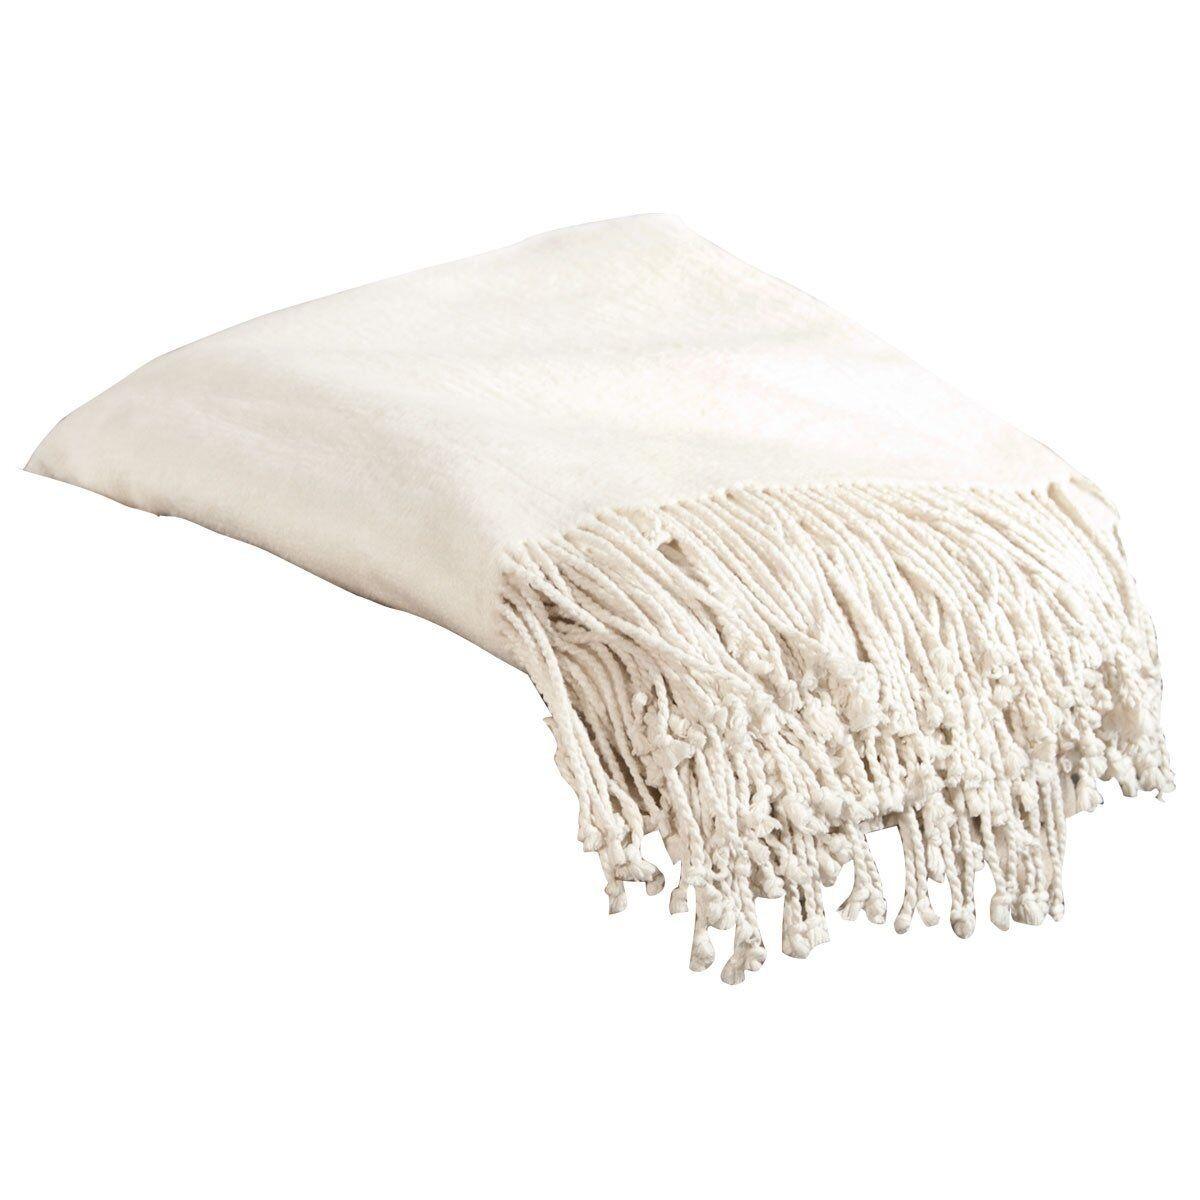 Aus Vio BM12124 100-Percent Silk Fleece Throw Blanket